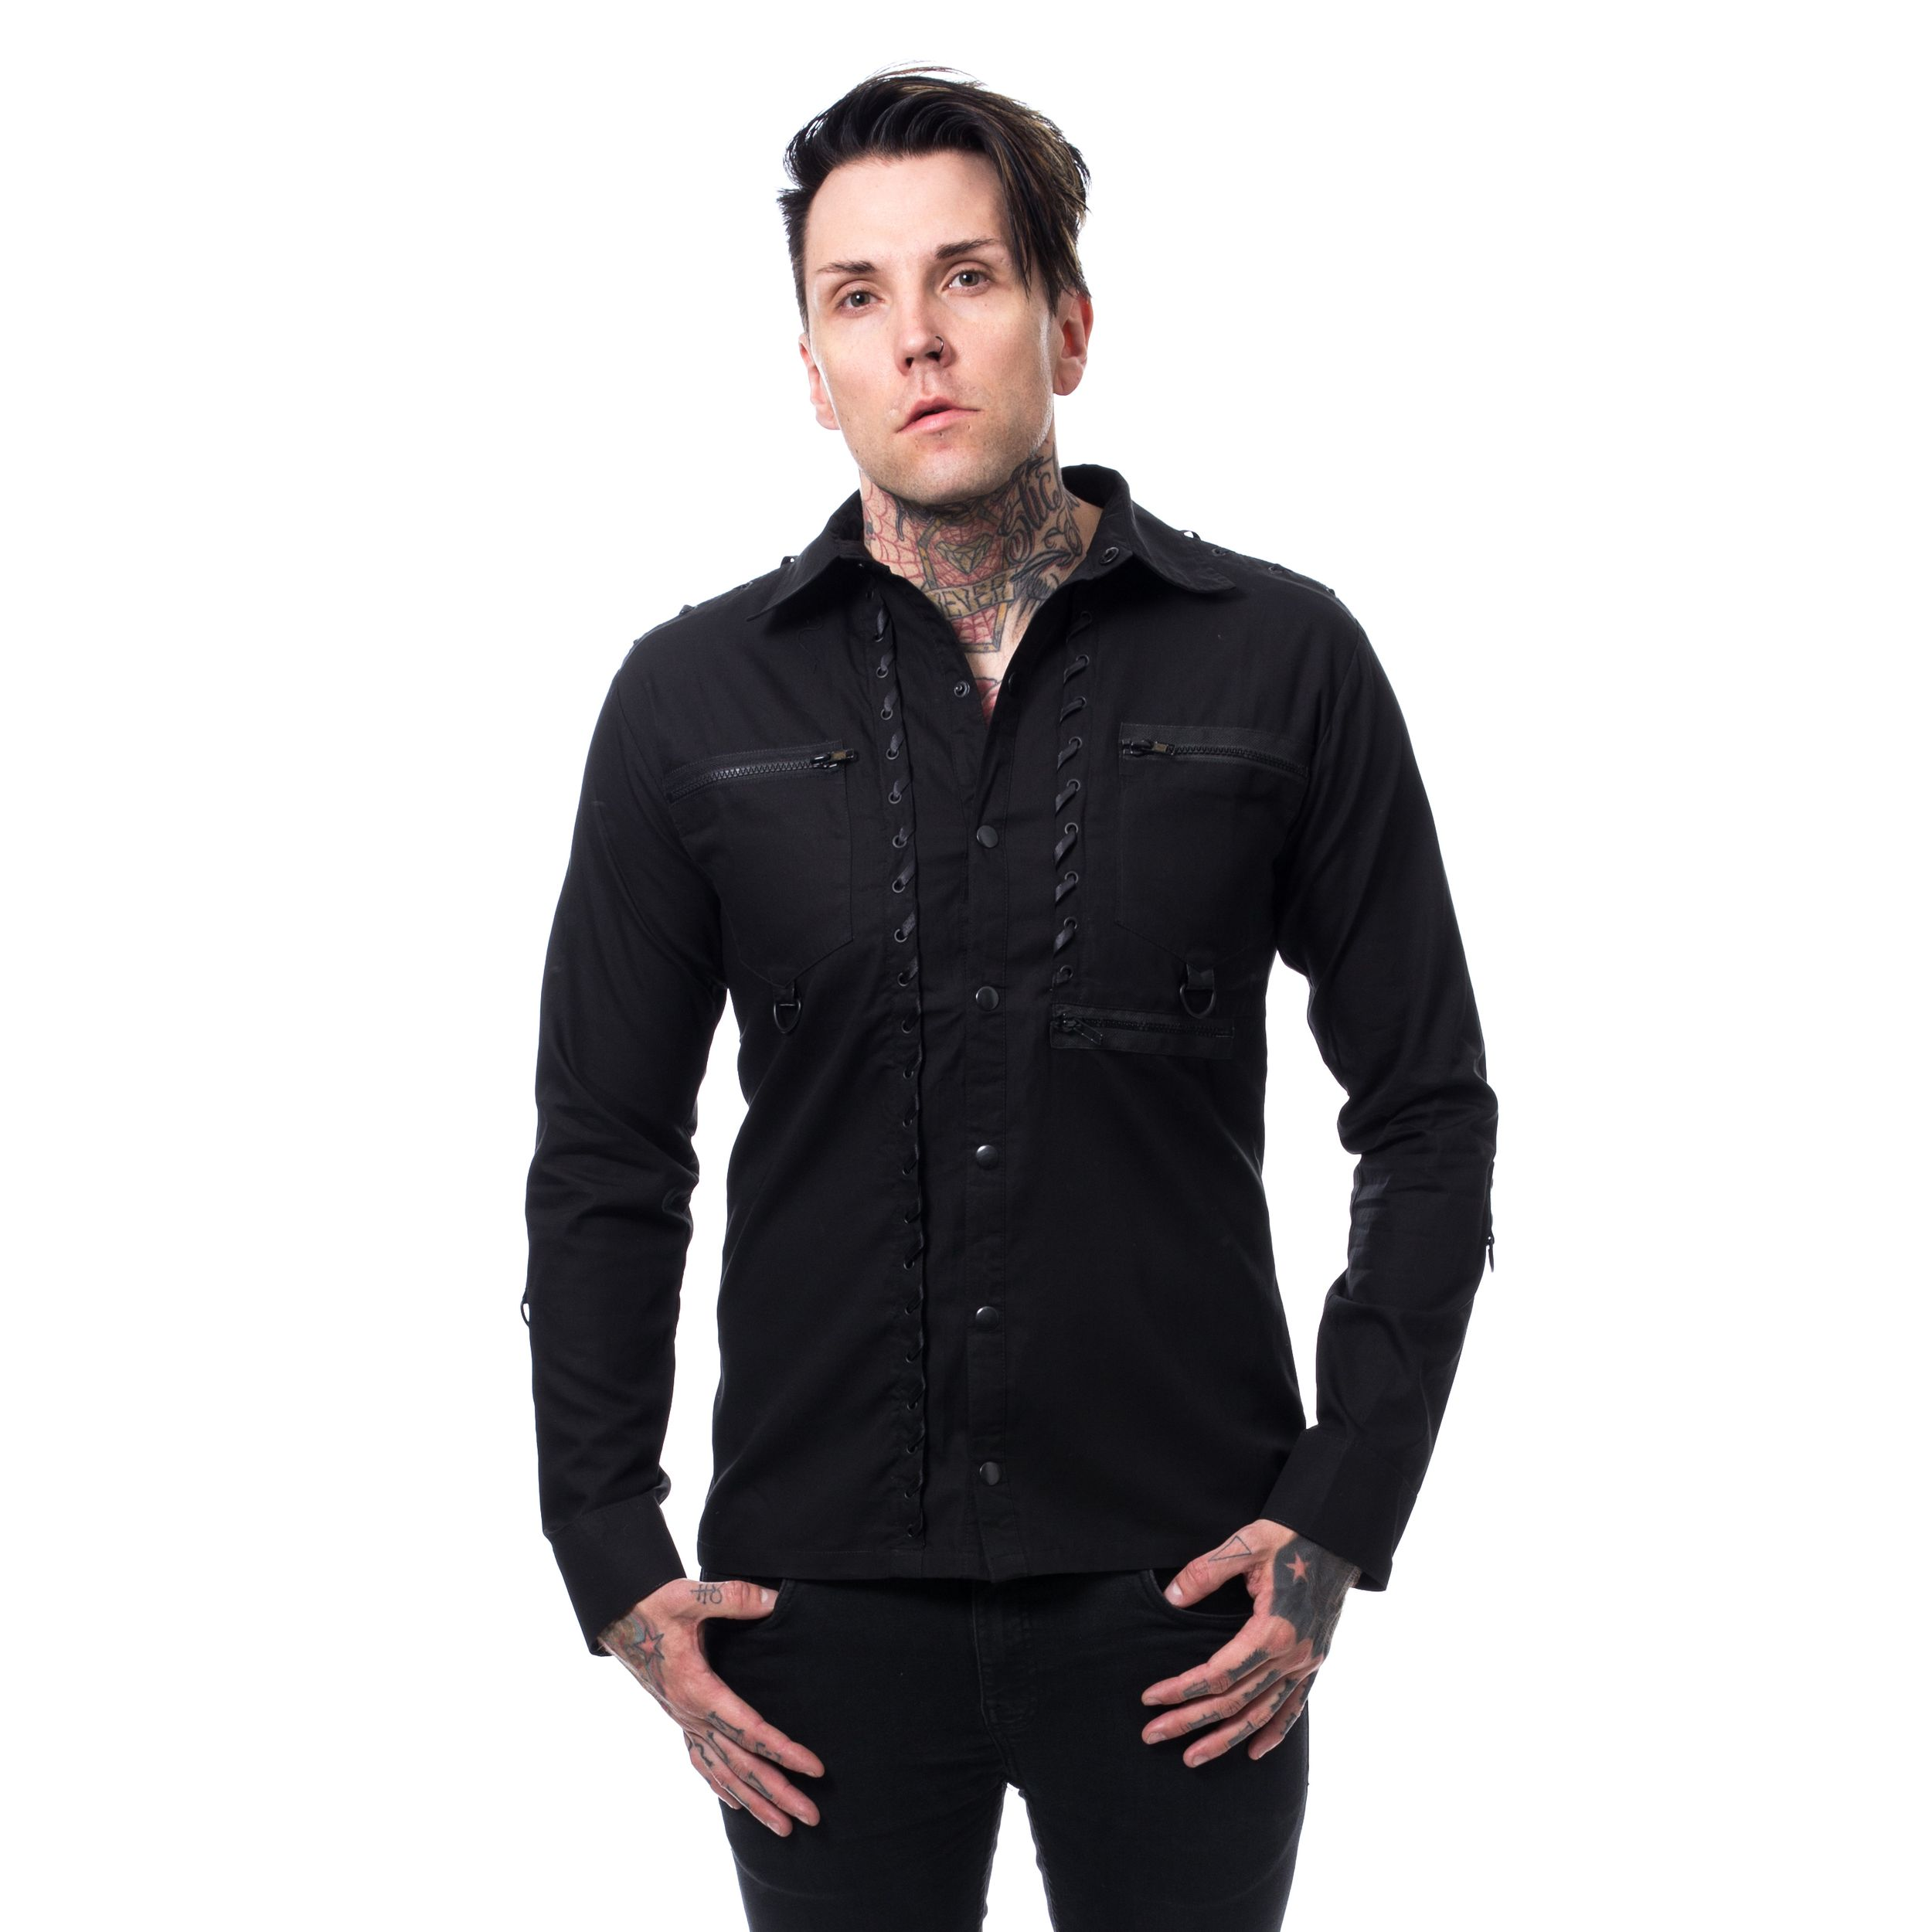 jackson-shirt-black-mens-poizen-industries-1